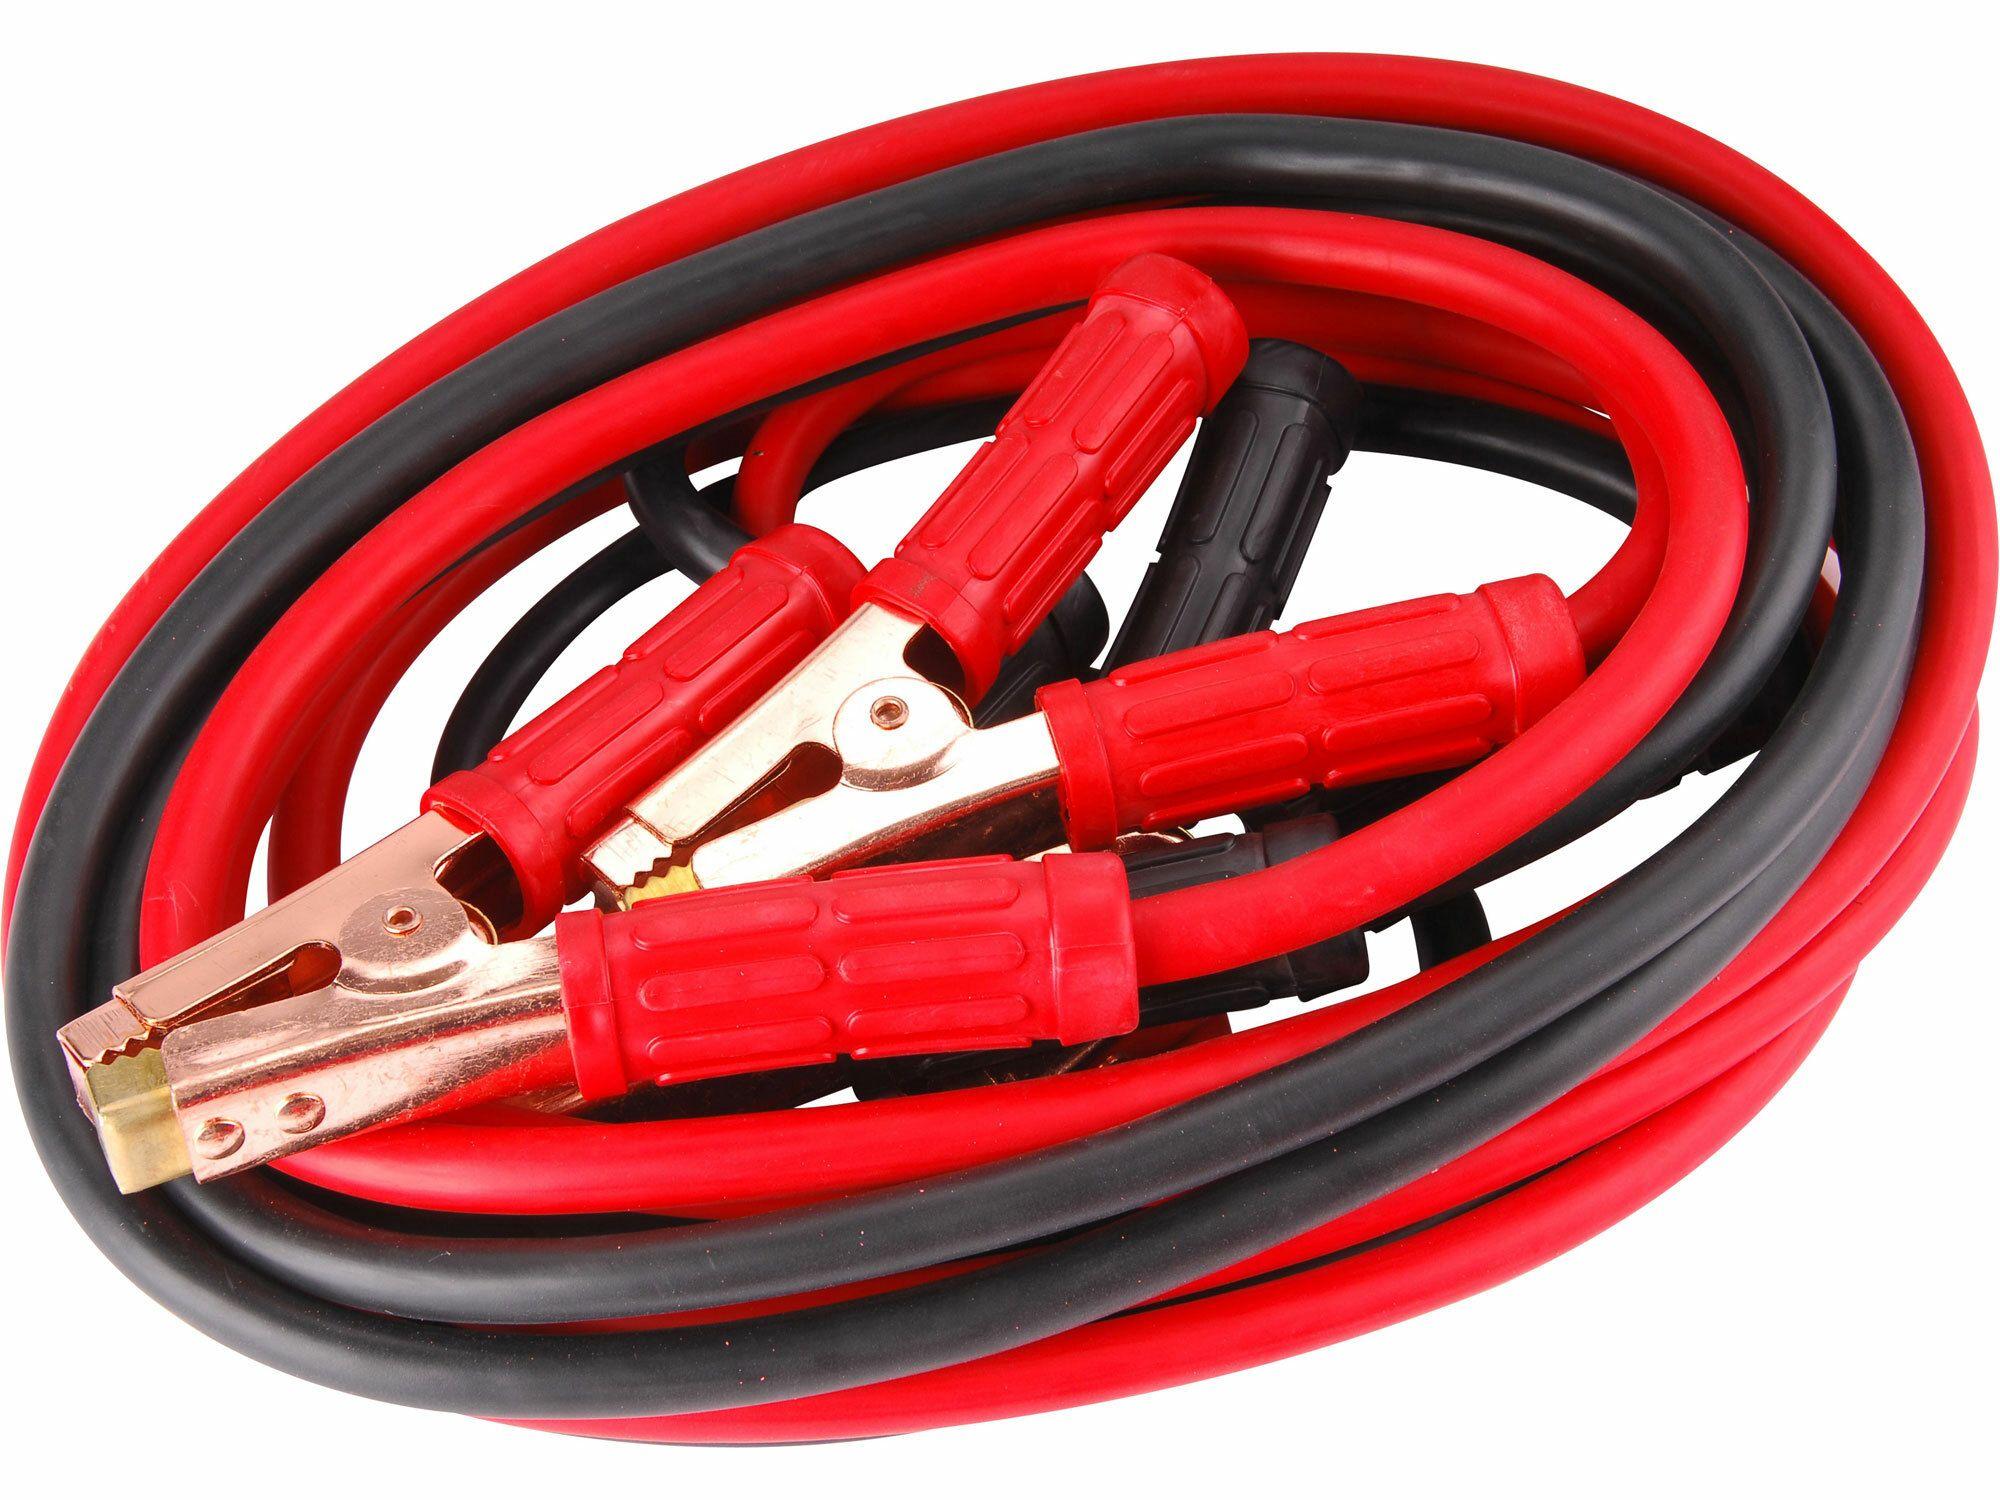 Kabel startovací, 800A, délka kabelu 5m, EXTOL PREMIUM 8864320